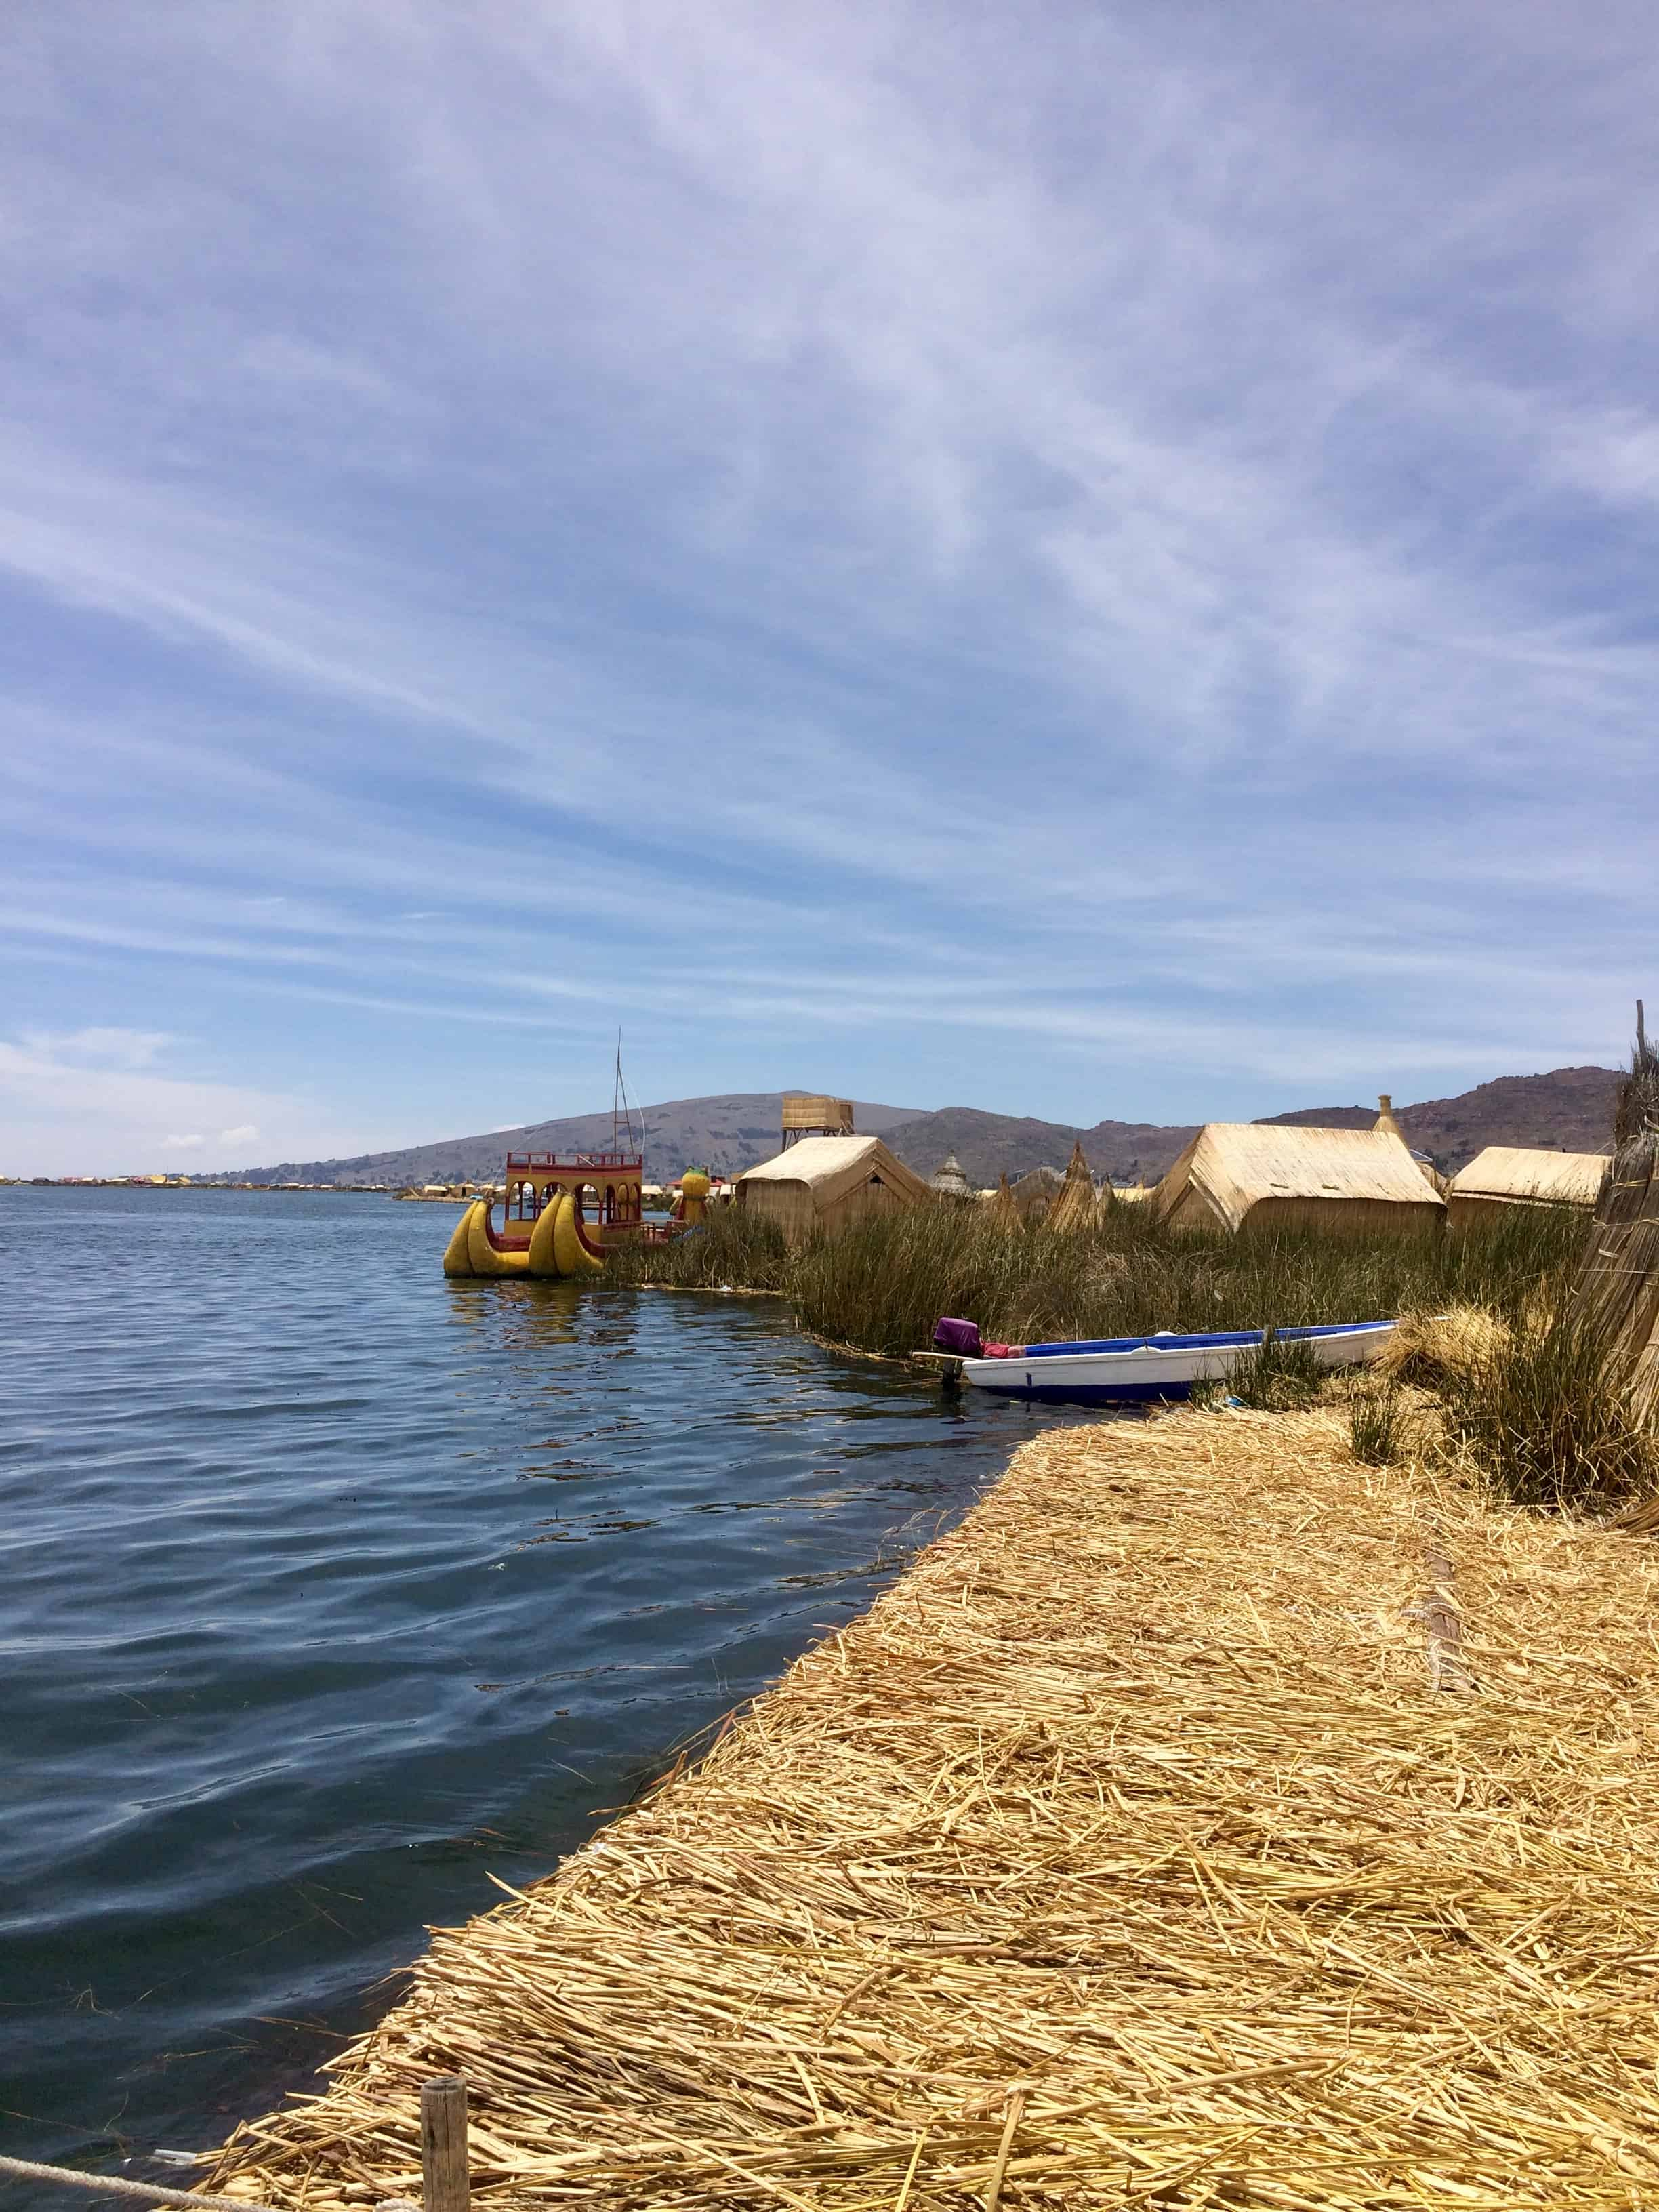 Uros-iles-puno-lac-titicaca